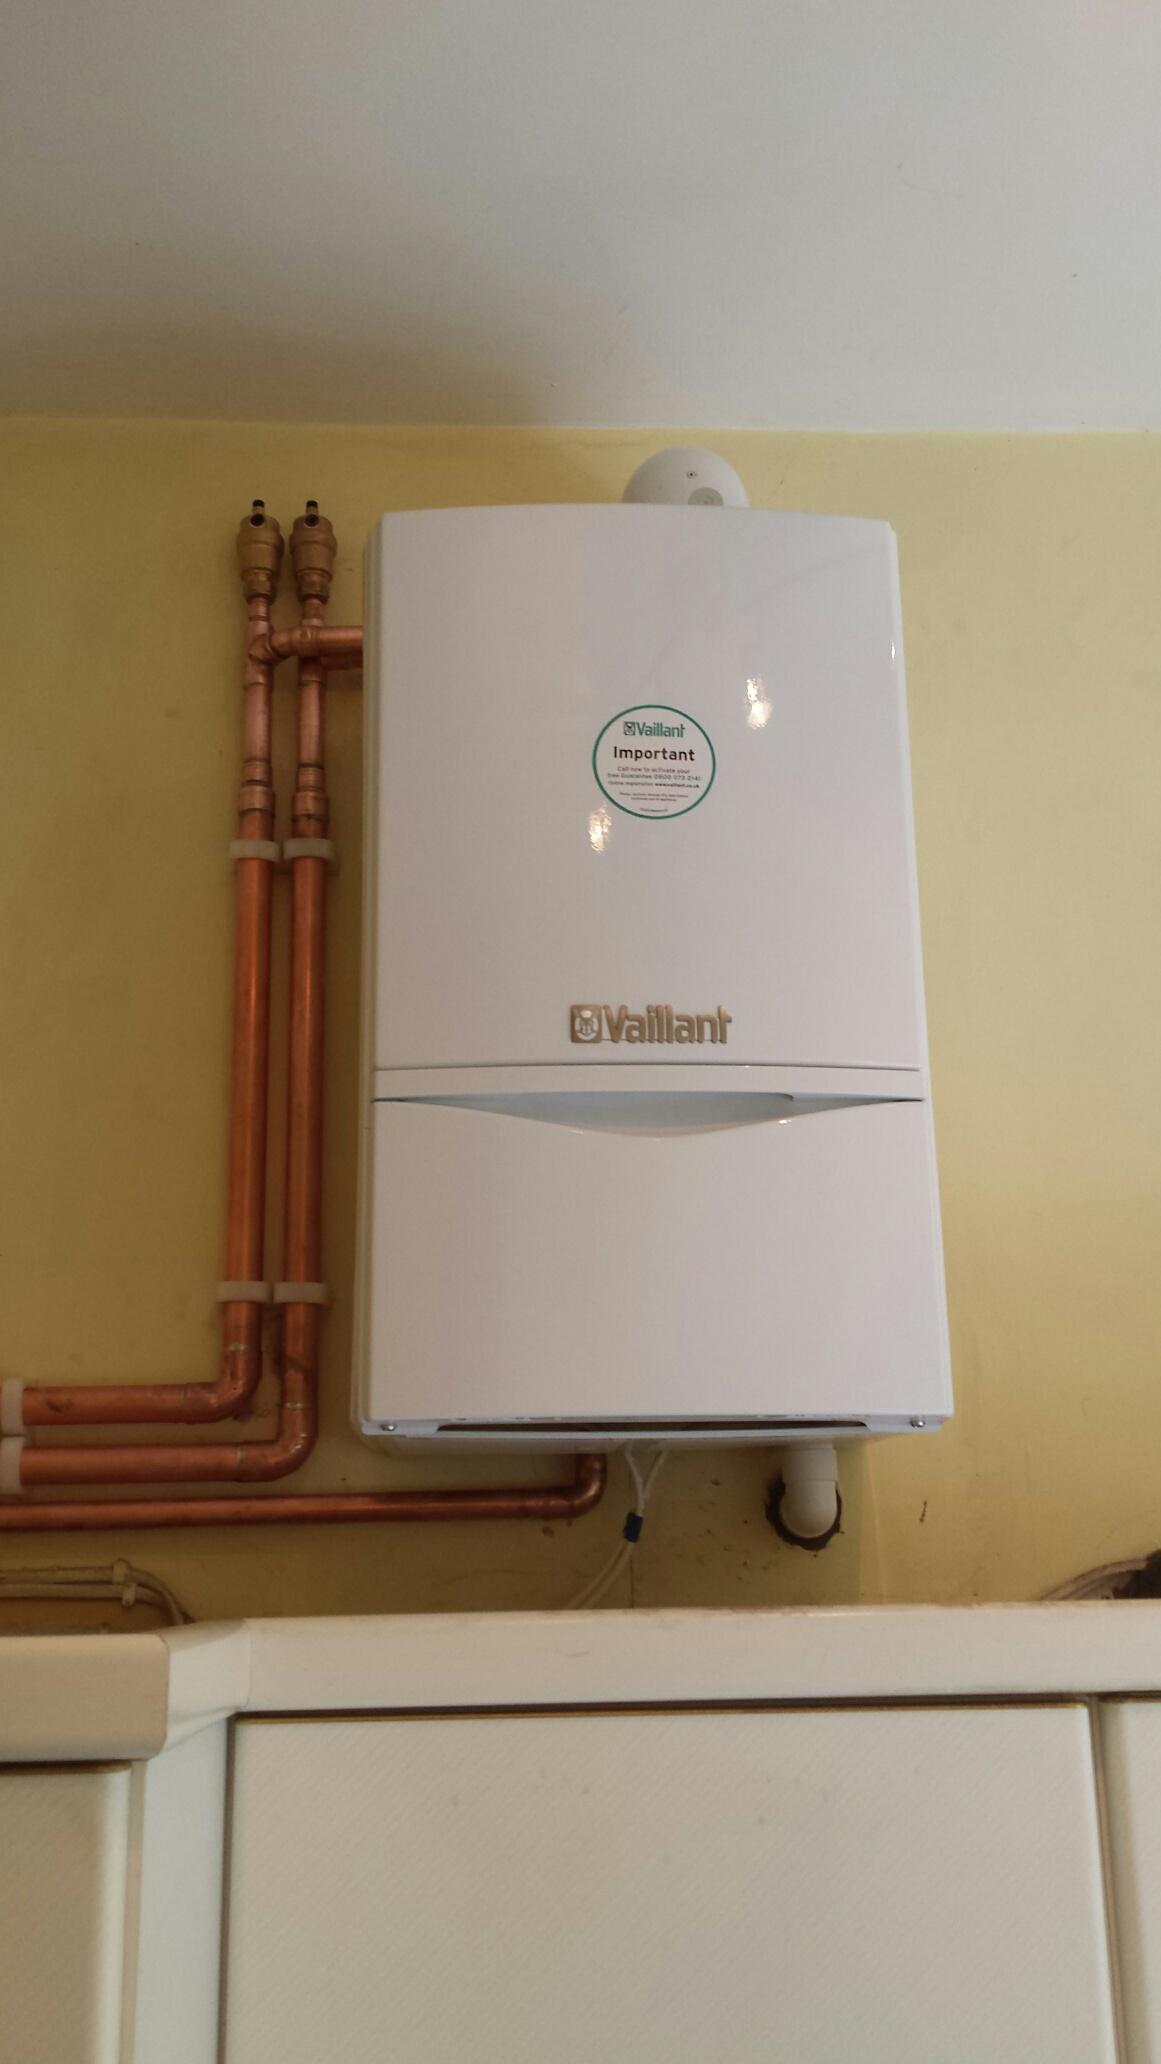 vaillant ecotec plus boiler wiring diagram wiring diagram Vaillant Ecotec Plus Wiring Diagram boiler manuals vaillant ecotec plus 831 vaillant ecotec plus wiring diagram